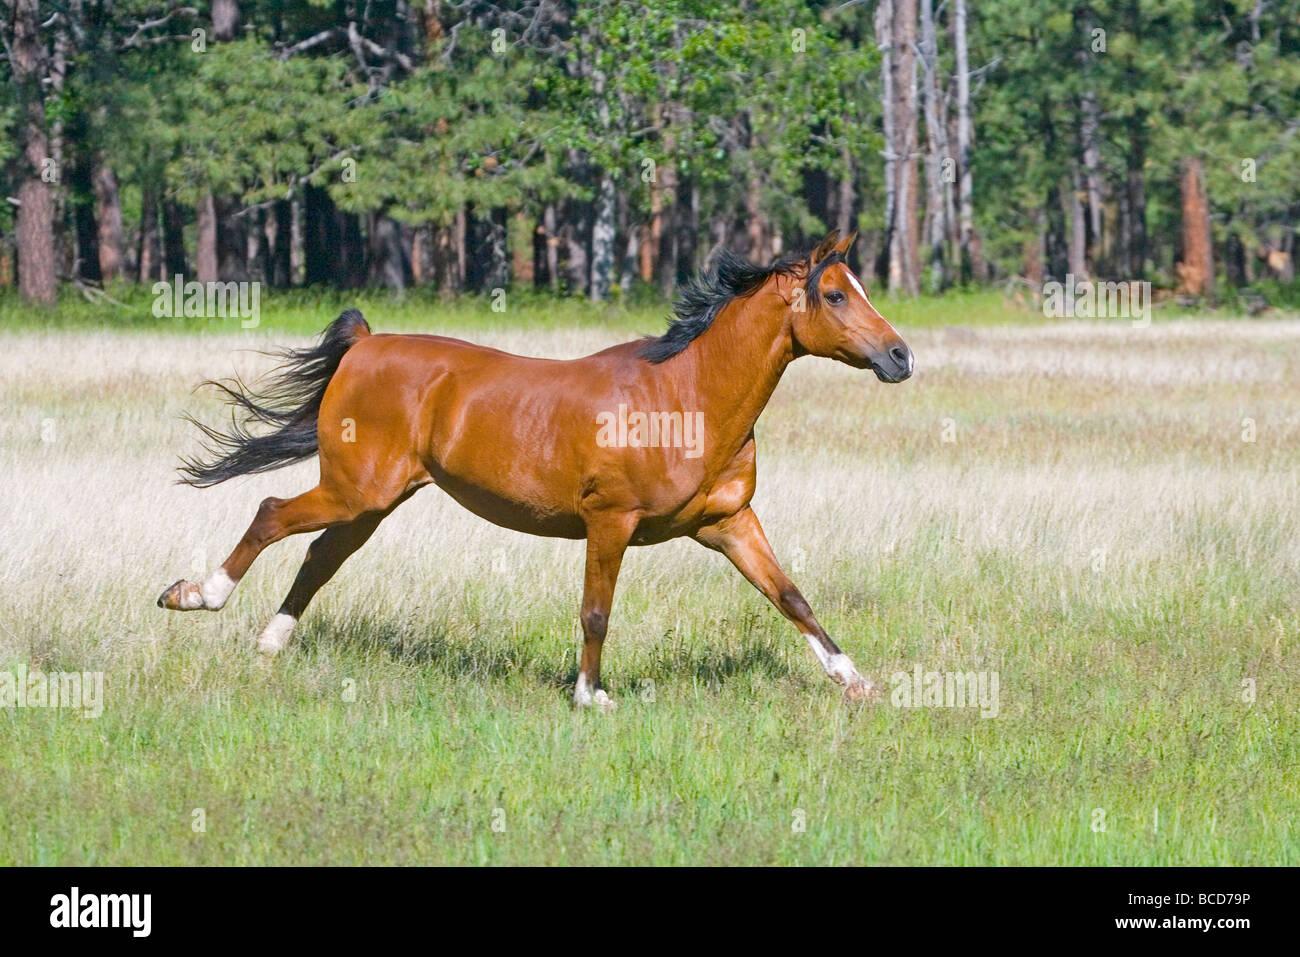 Arabian Horse - Stock Image